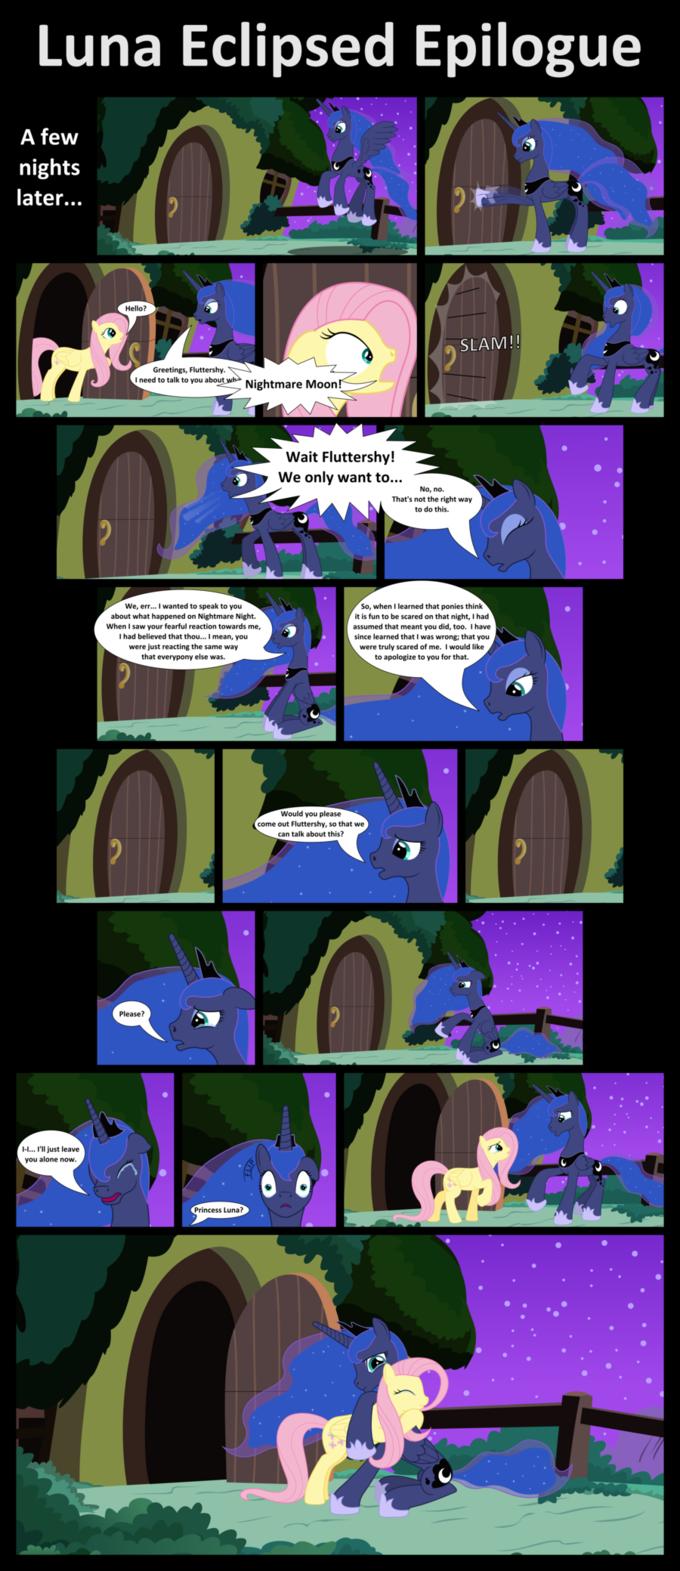 Luna Eclipsed Epilogue